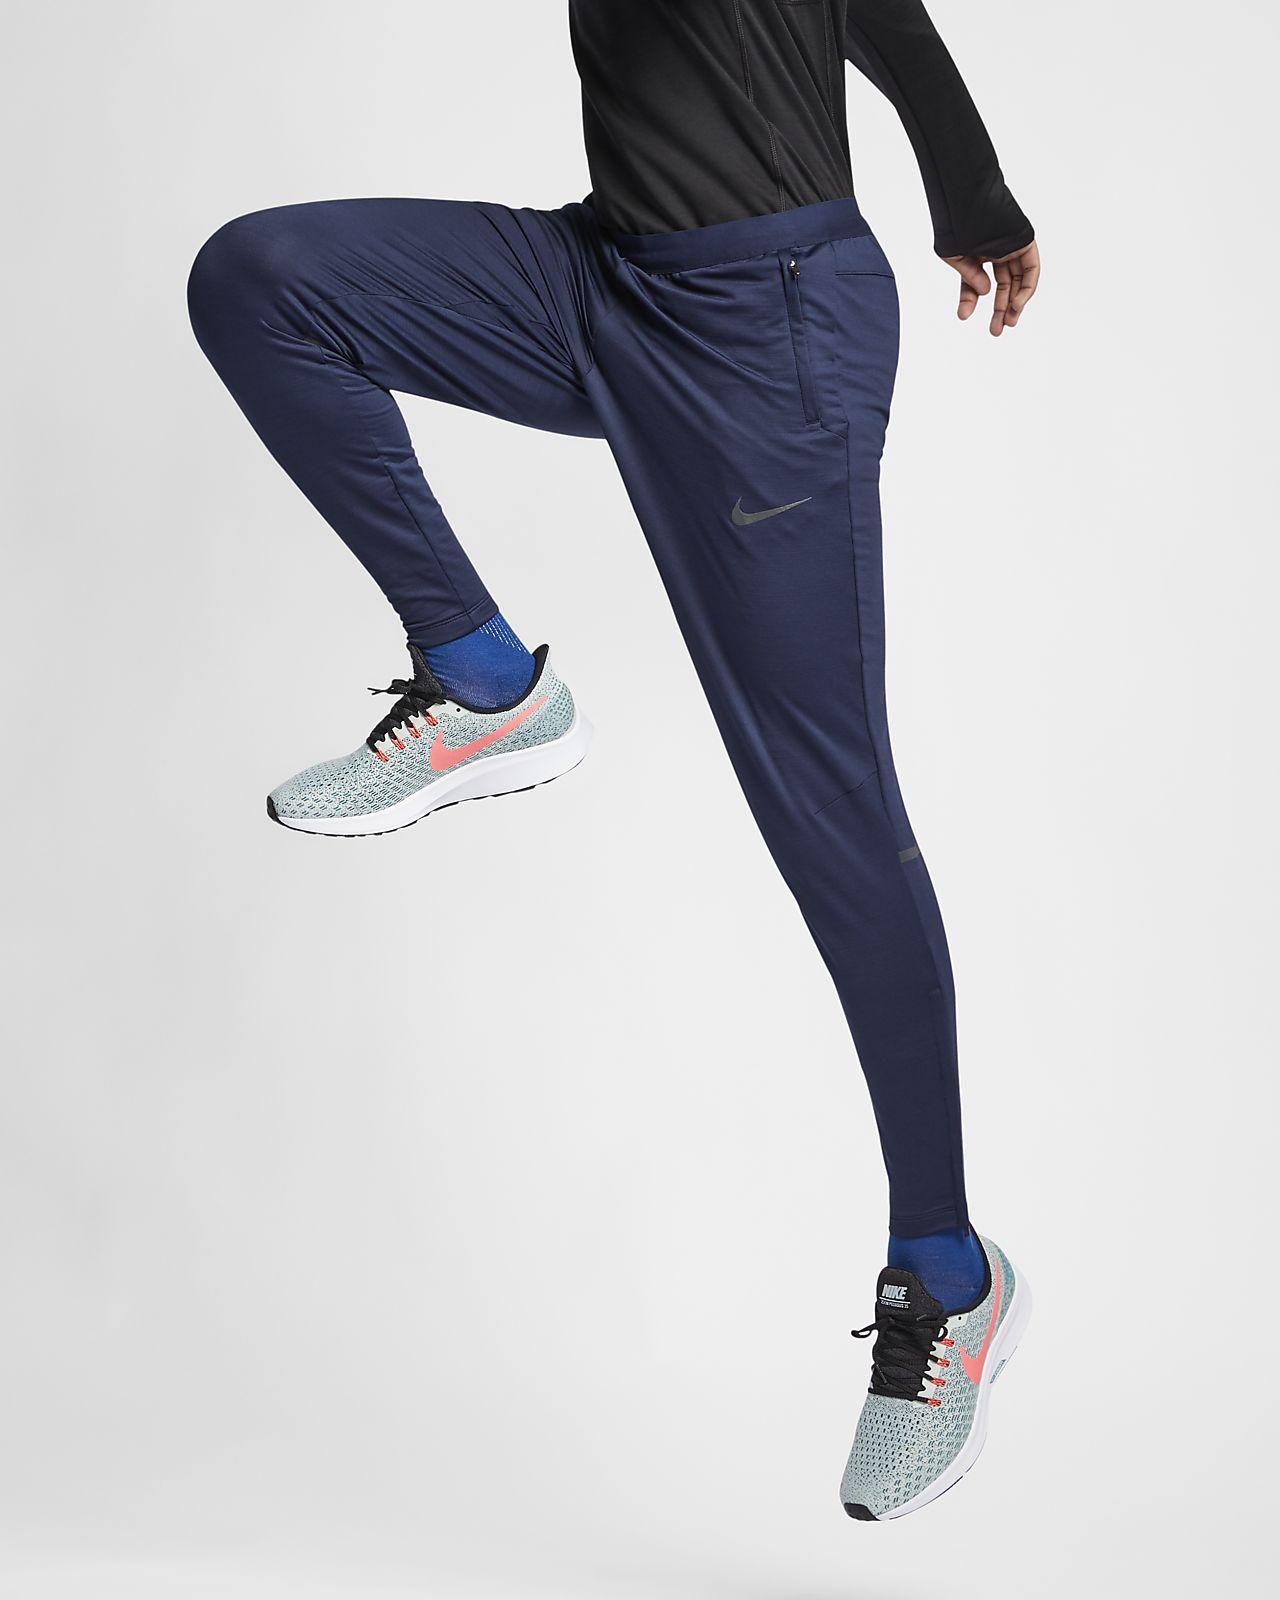 Pantalones de running para hombre Nike Phenom